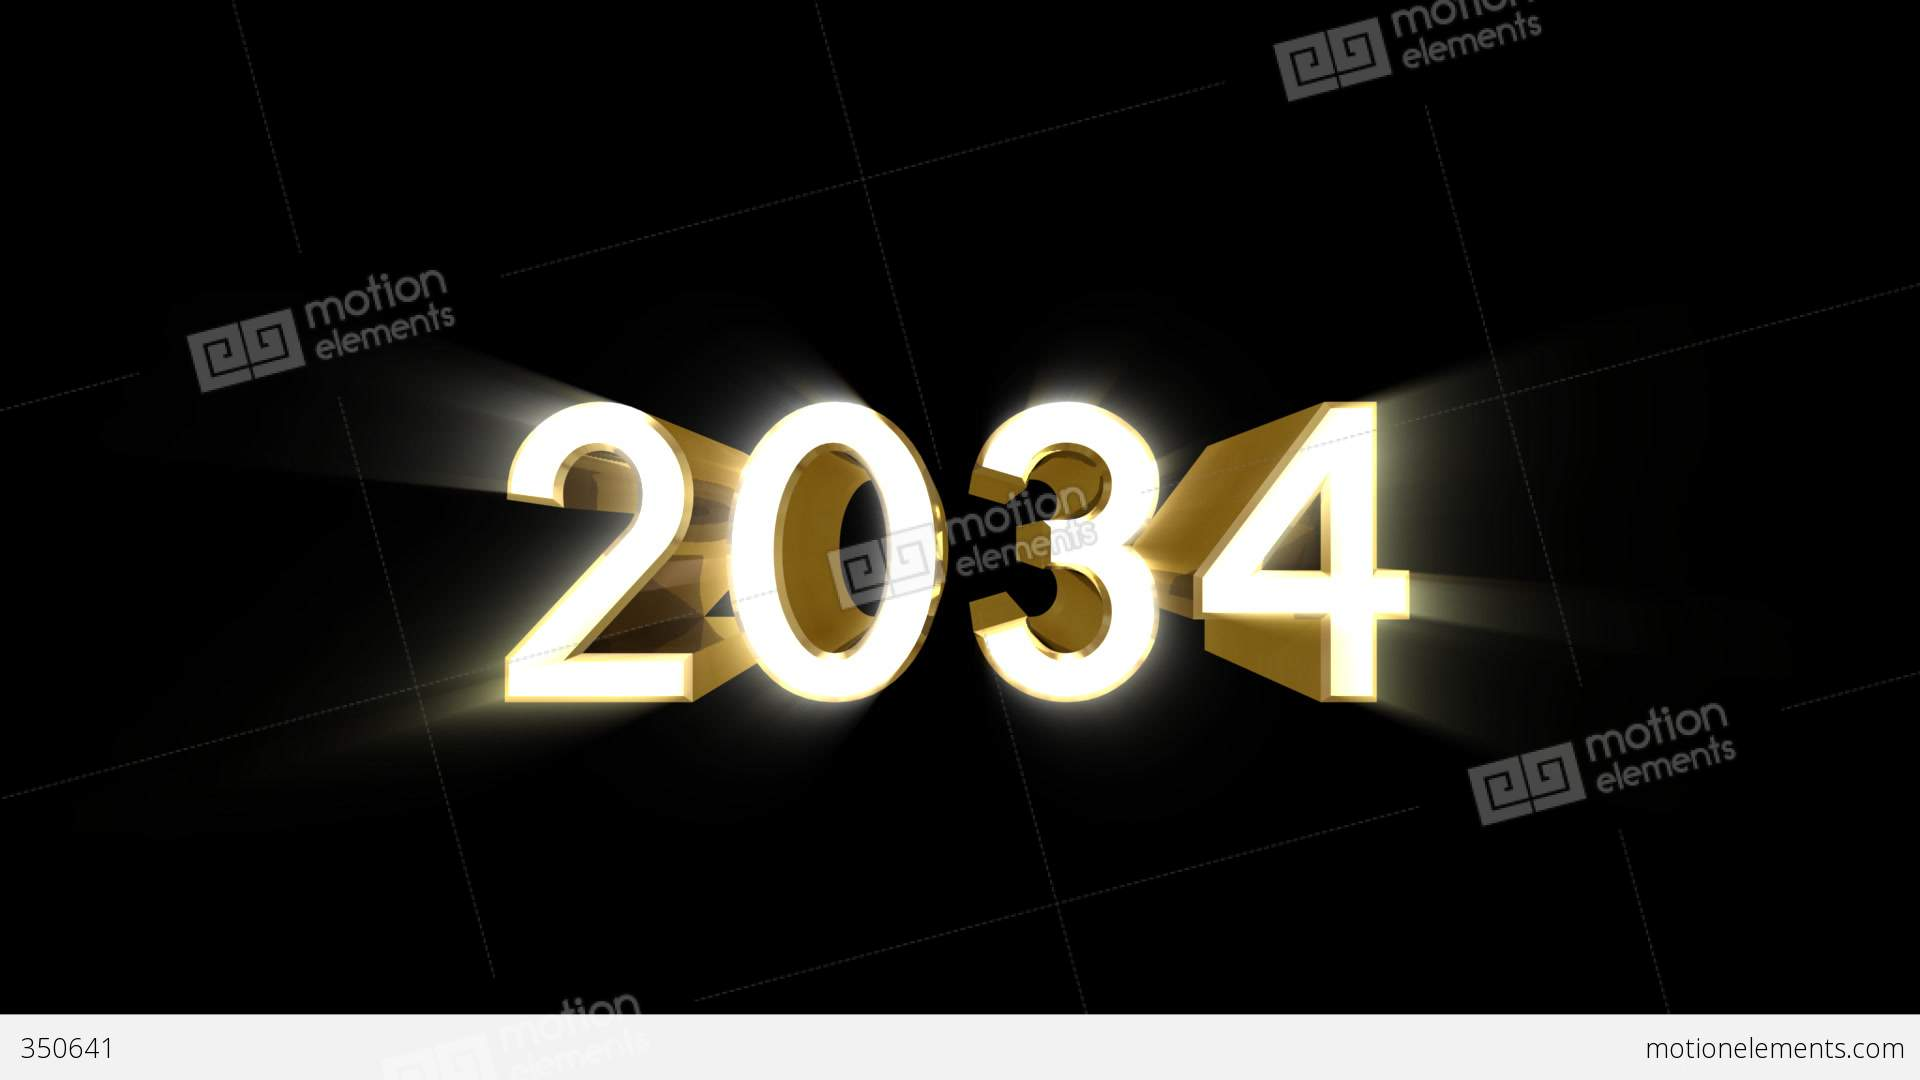 Year a stock animation jpg 1920x1080 Year 2034 society